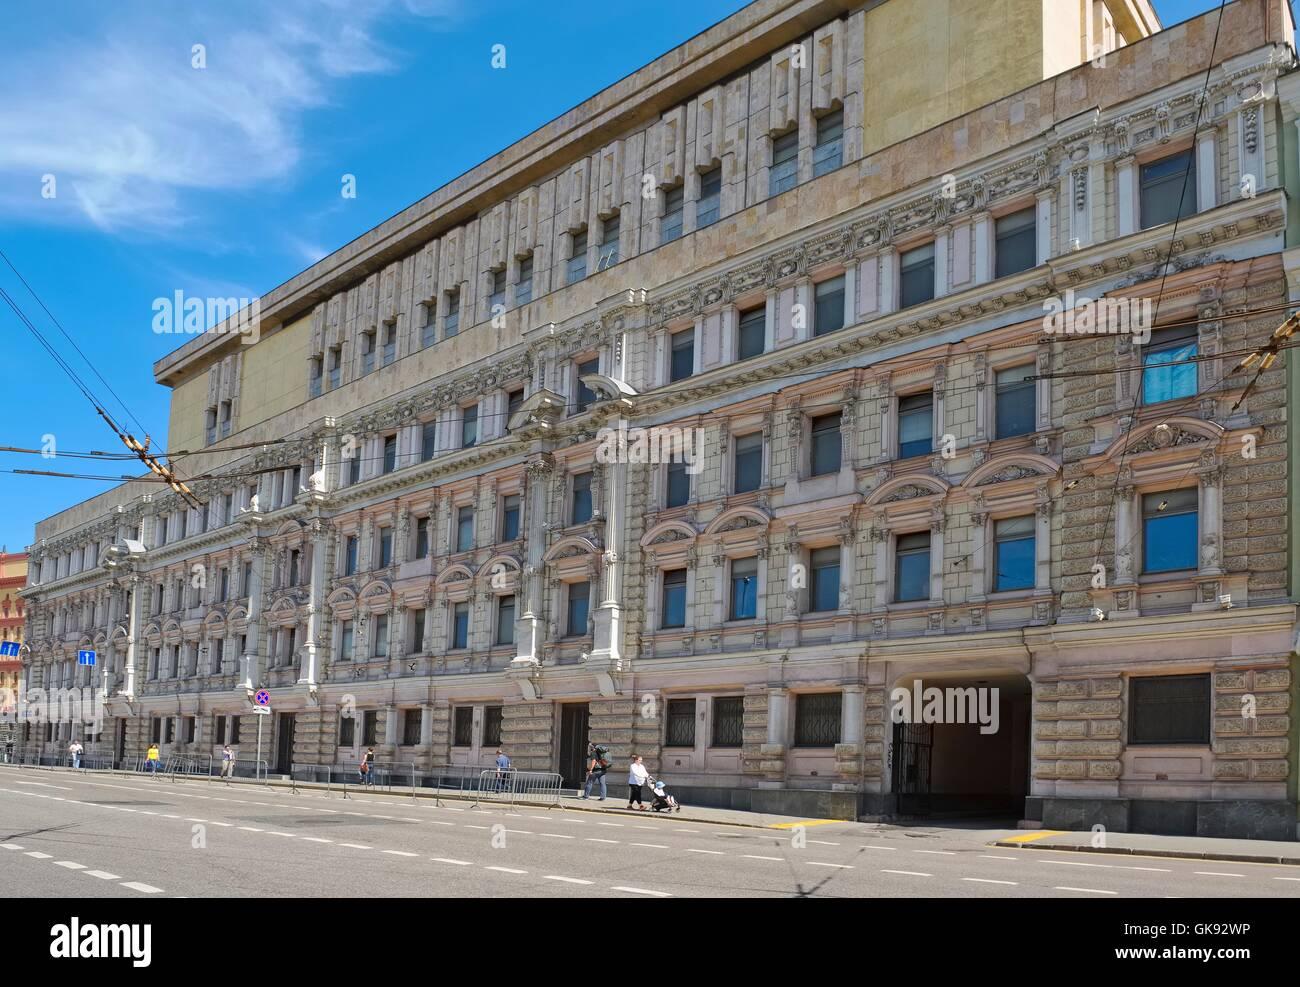 Profitable House N.D. Stakheeva, Myasnitskaya Street, 6/3, View with Lubyansky lane, landmark, built in 1898 - Stock Image